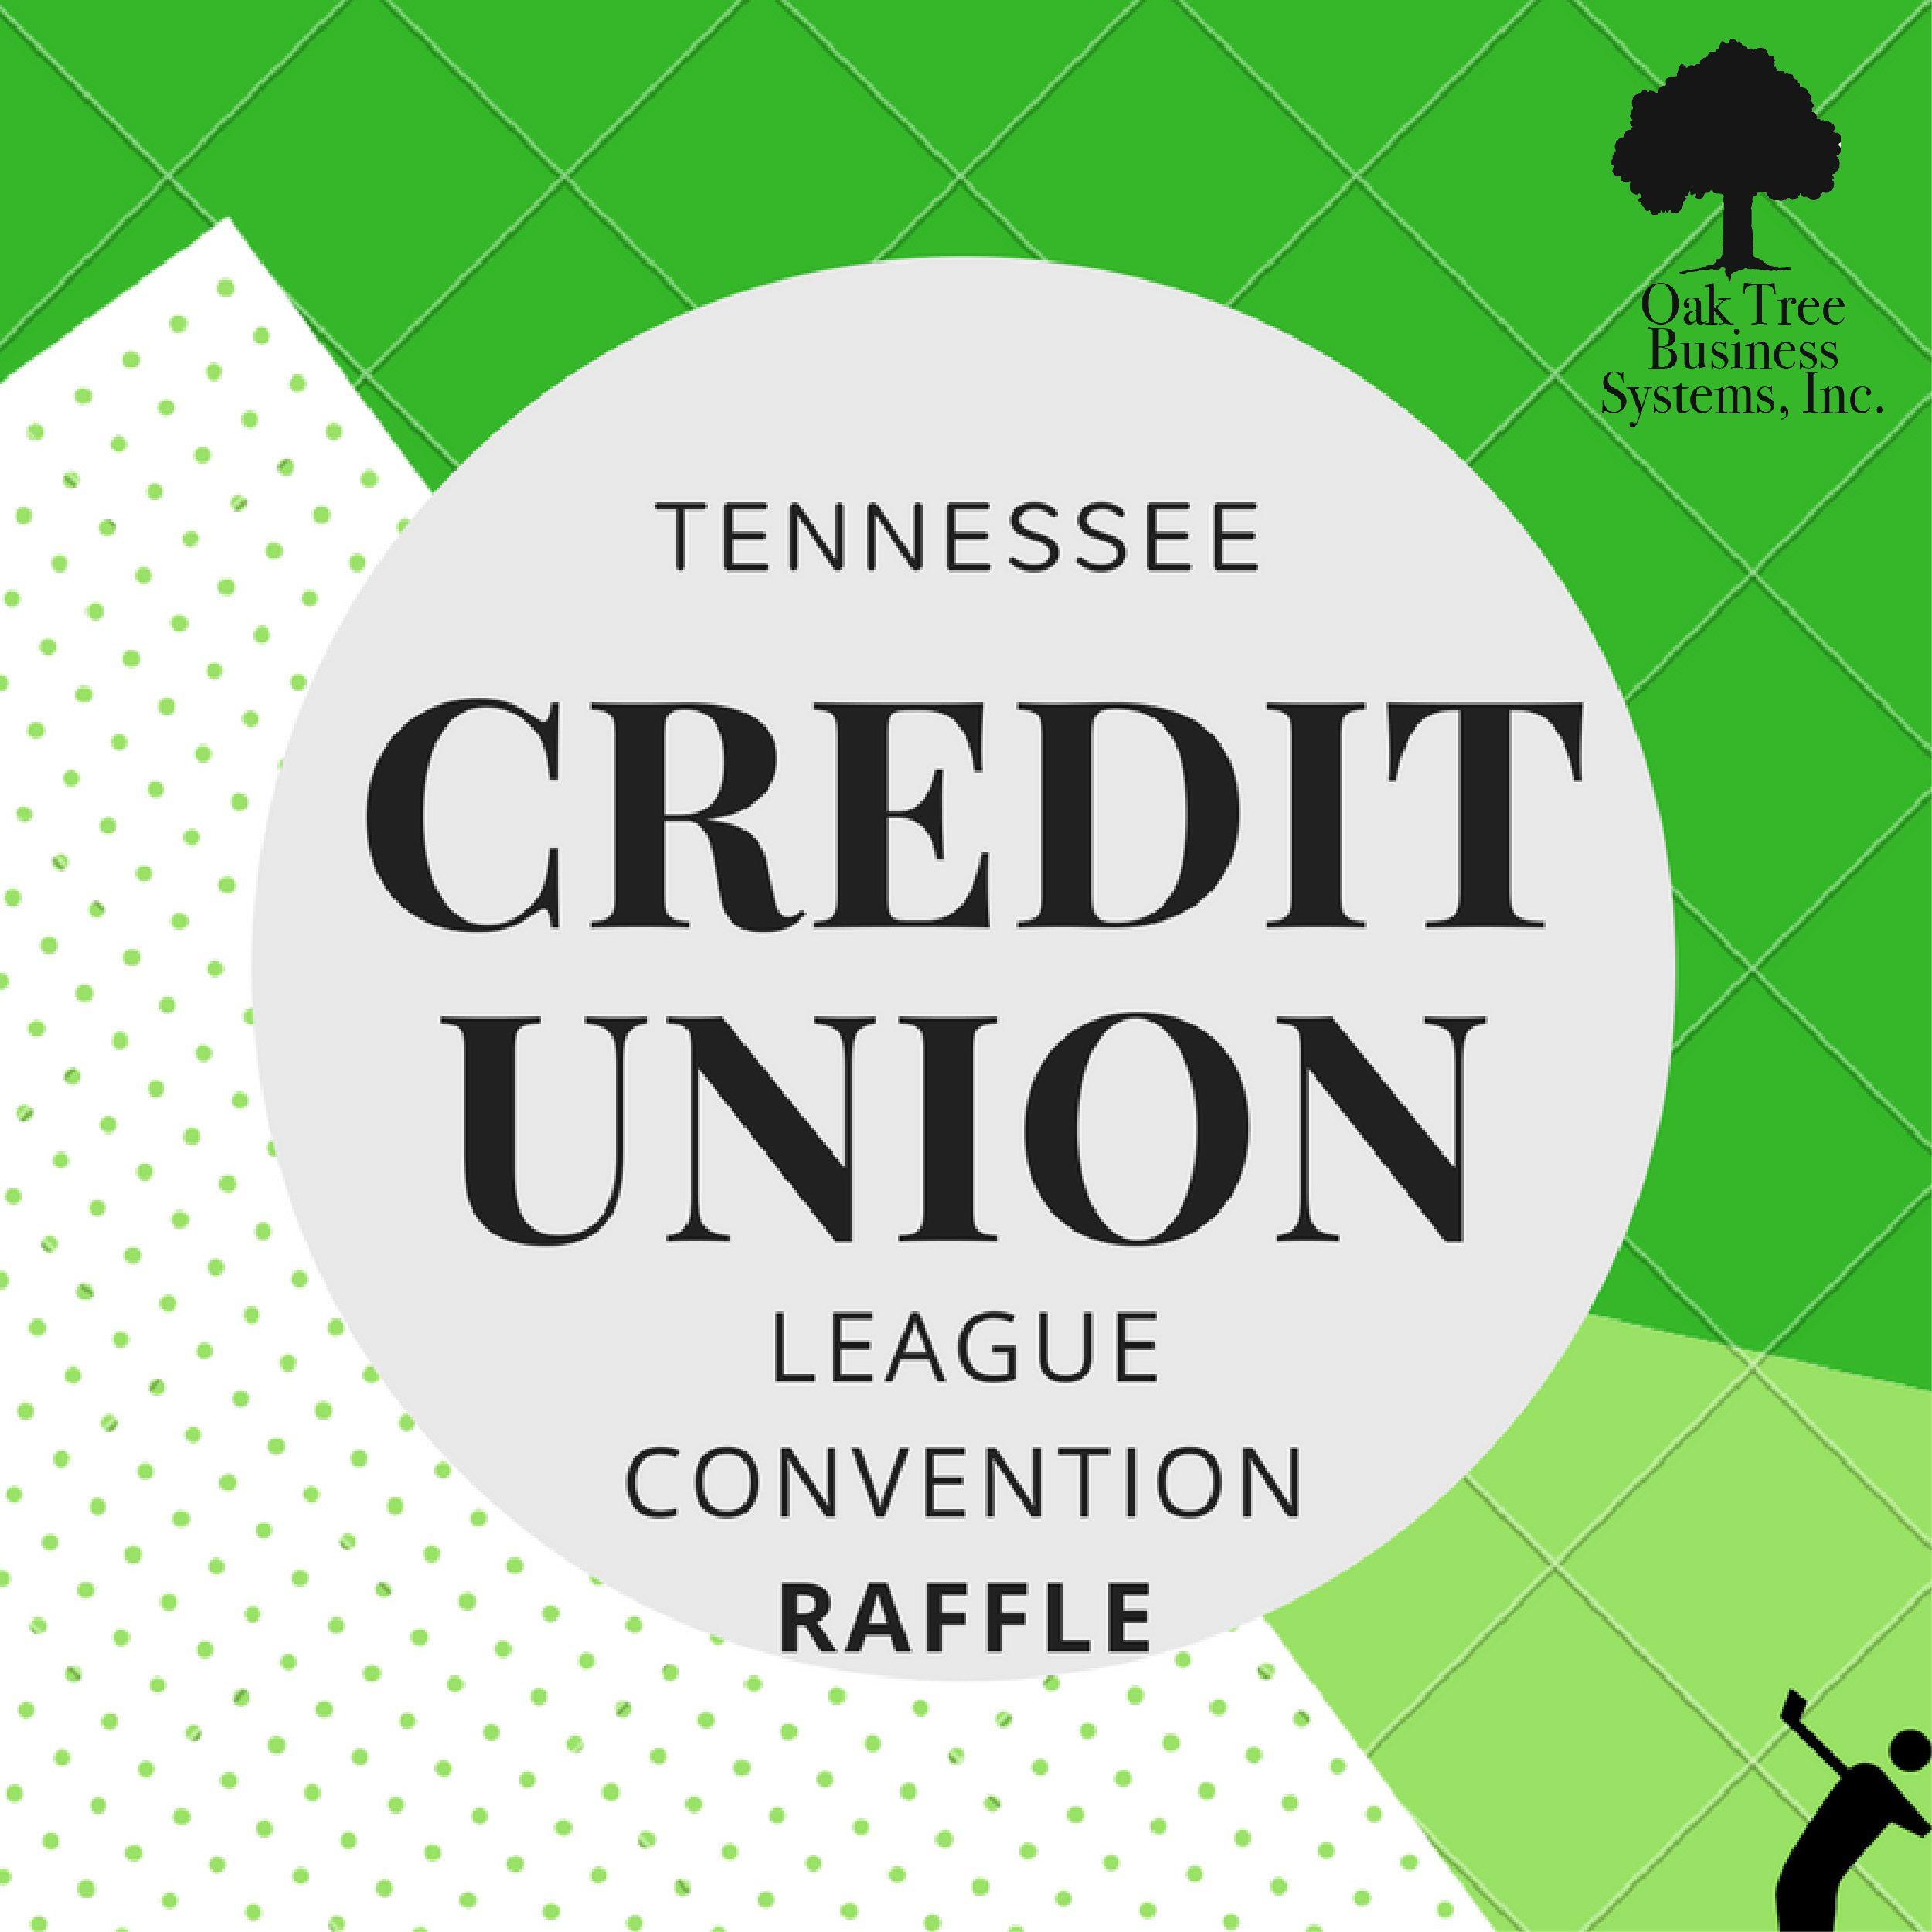 Tennessee Credit Unions Golf Raffle Credit union, Raffle